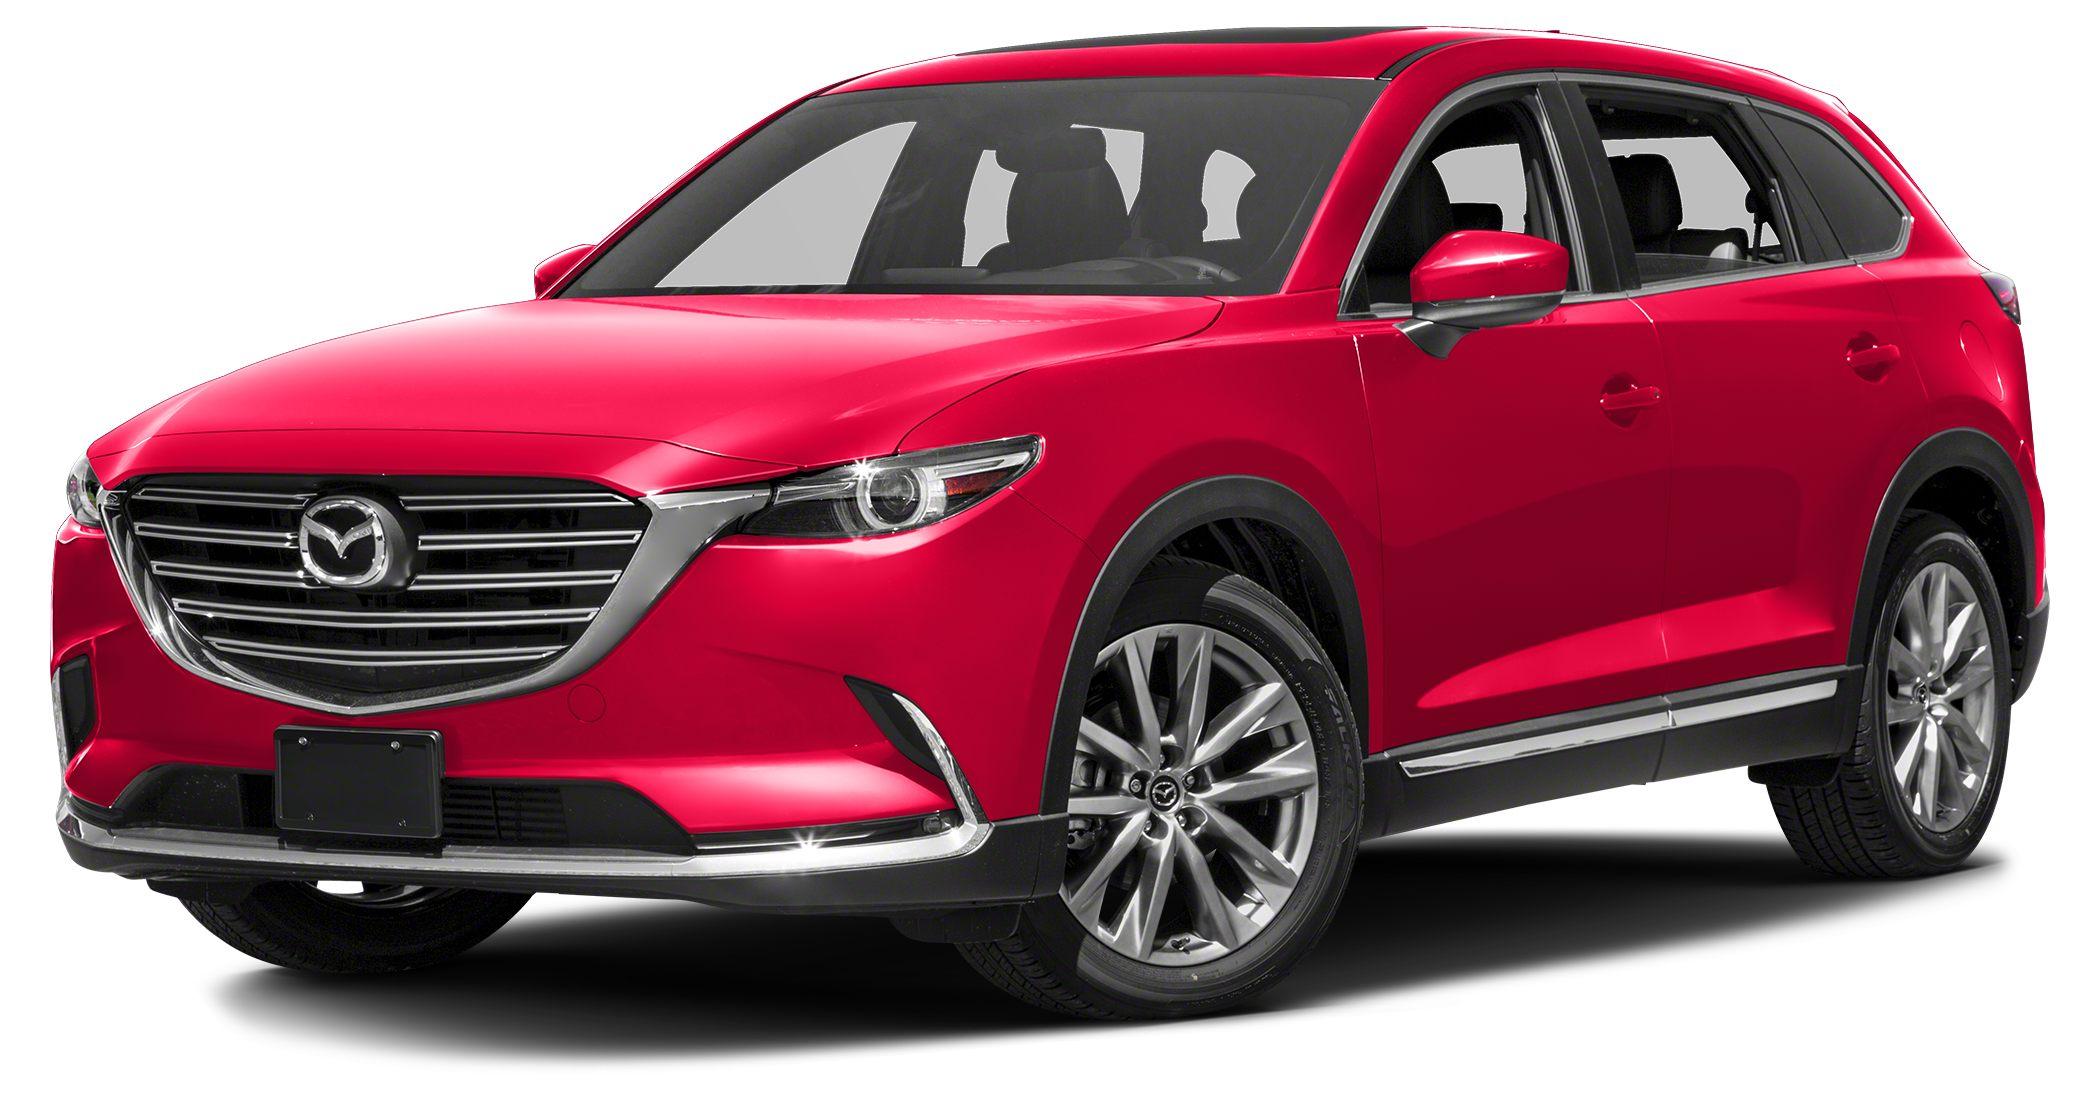 2016 Mazda CX-9 Grand Touring Introducing the 2016 Mazda Mazda CX-9 Stylish and sophisticated th